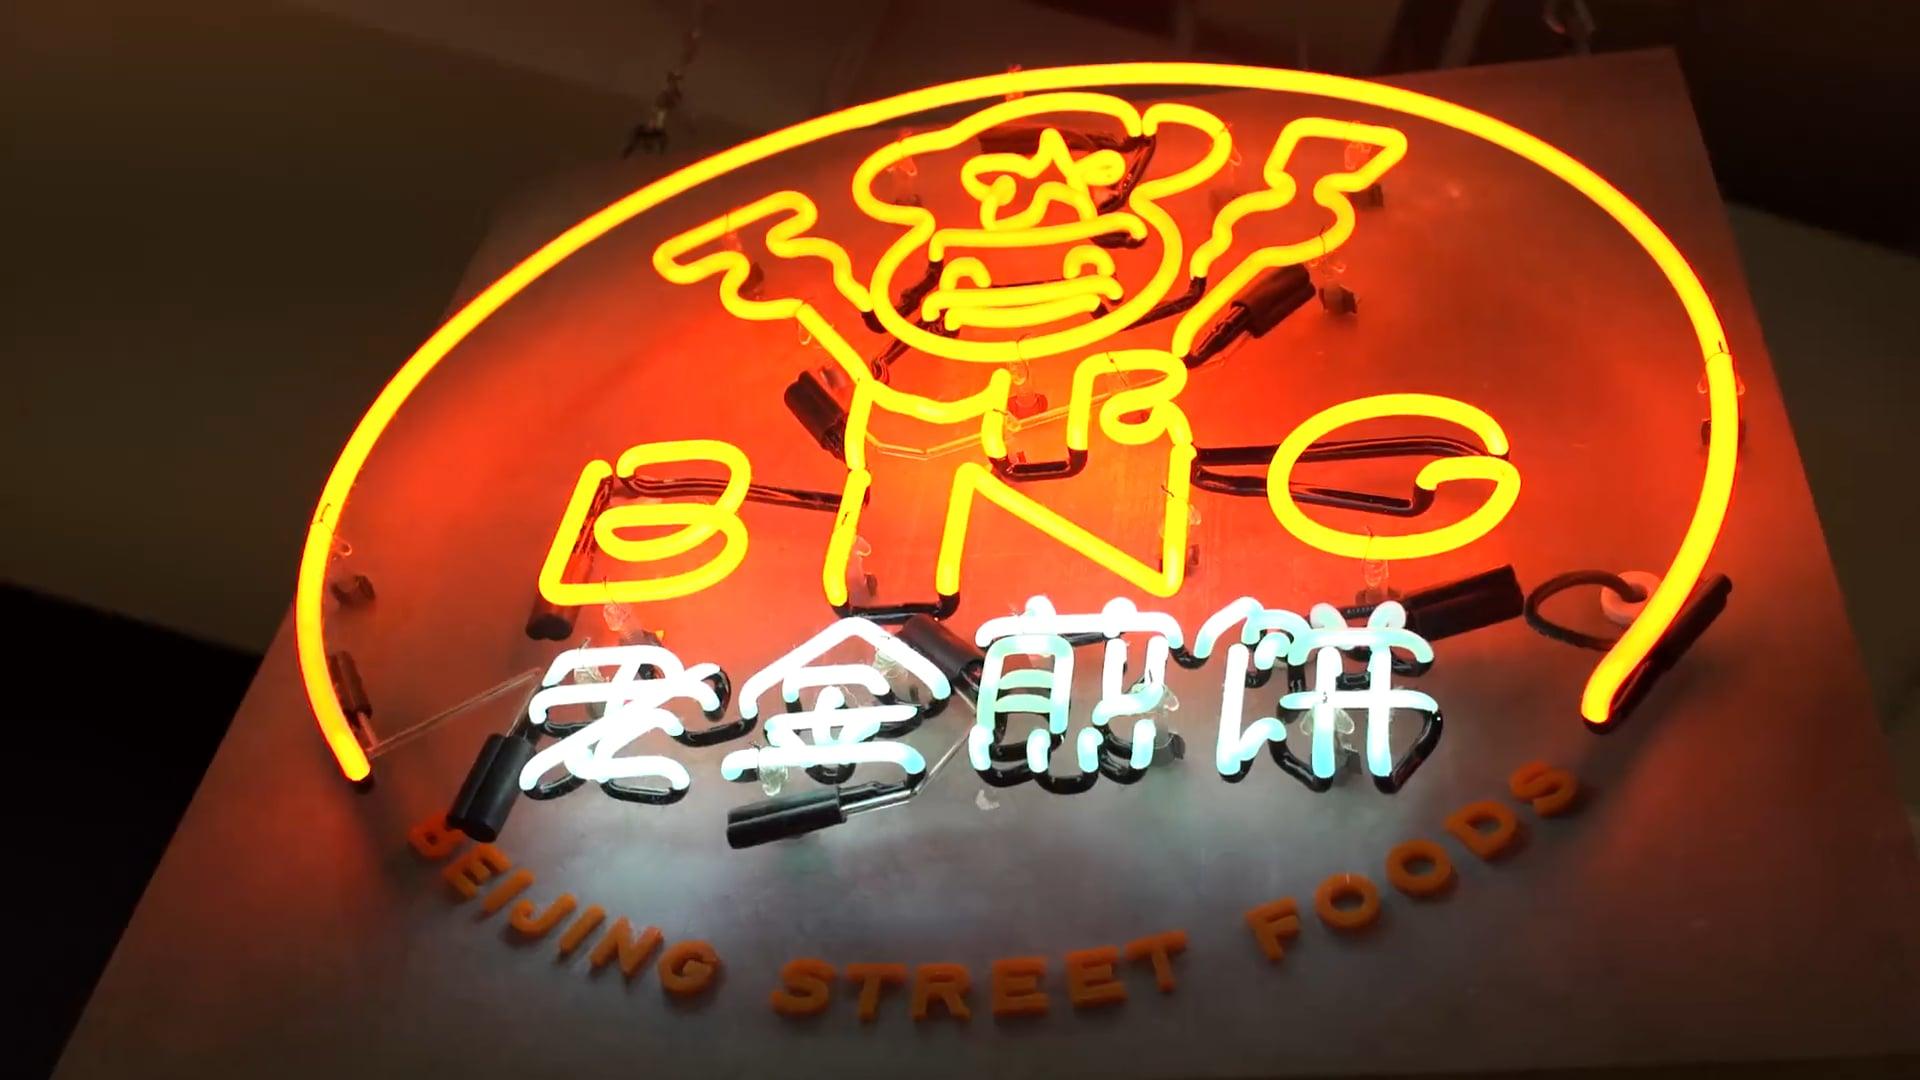 True Treps: Mr Bing, NYC